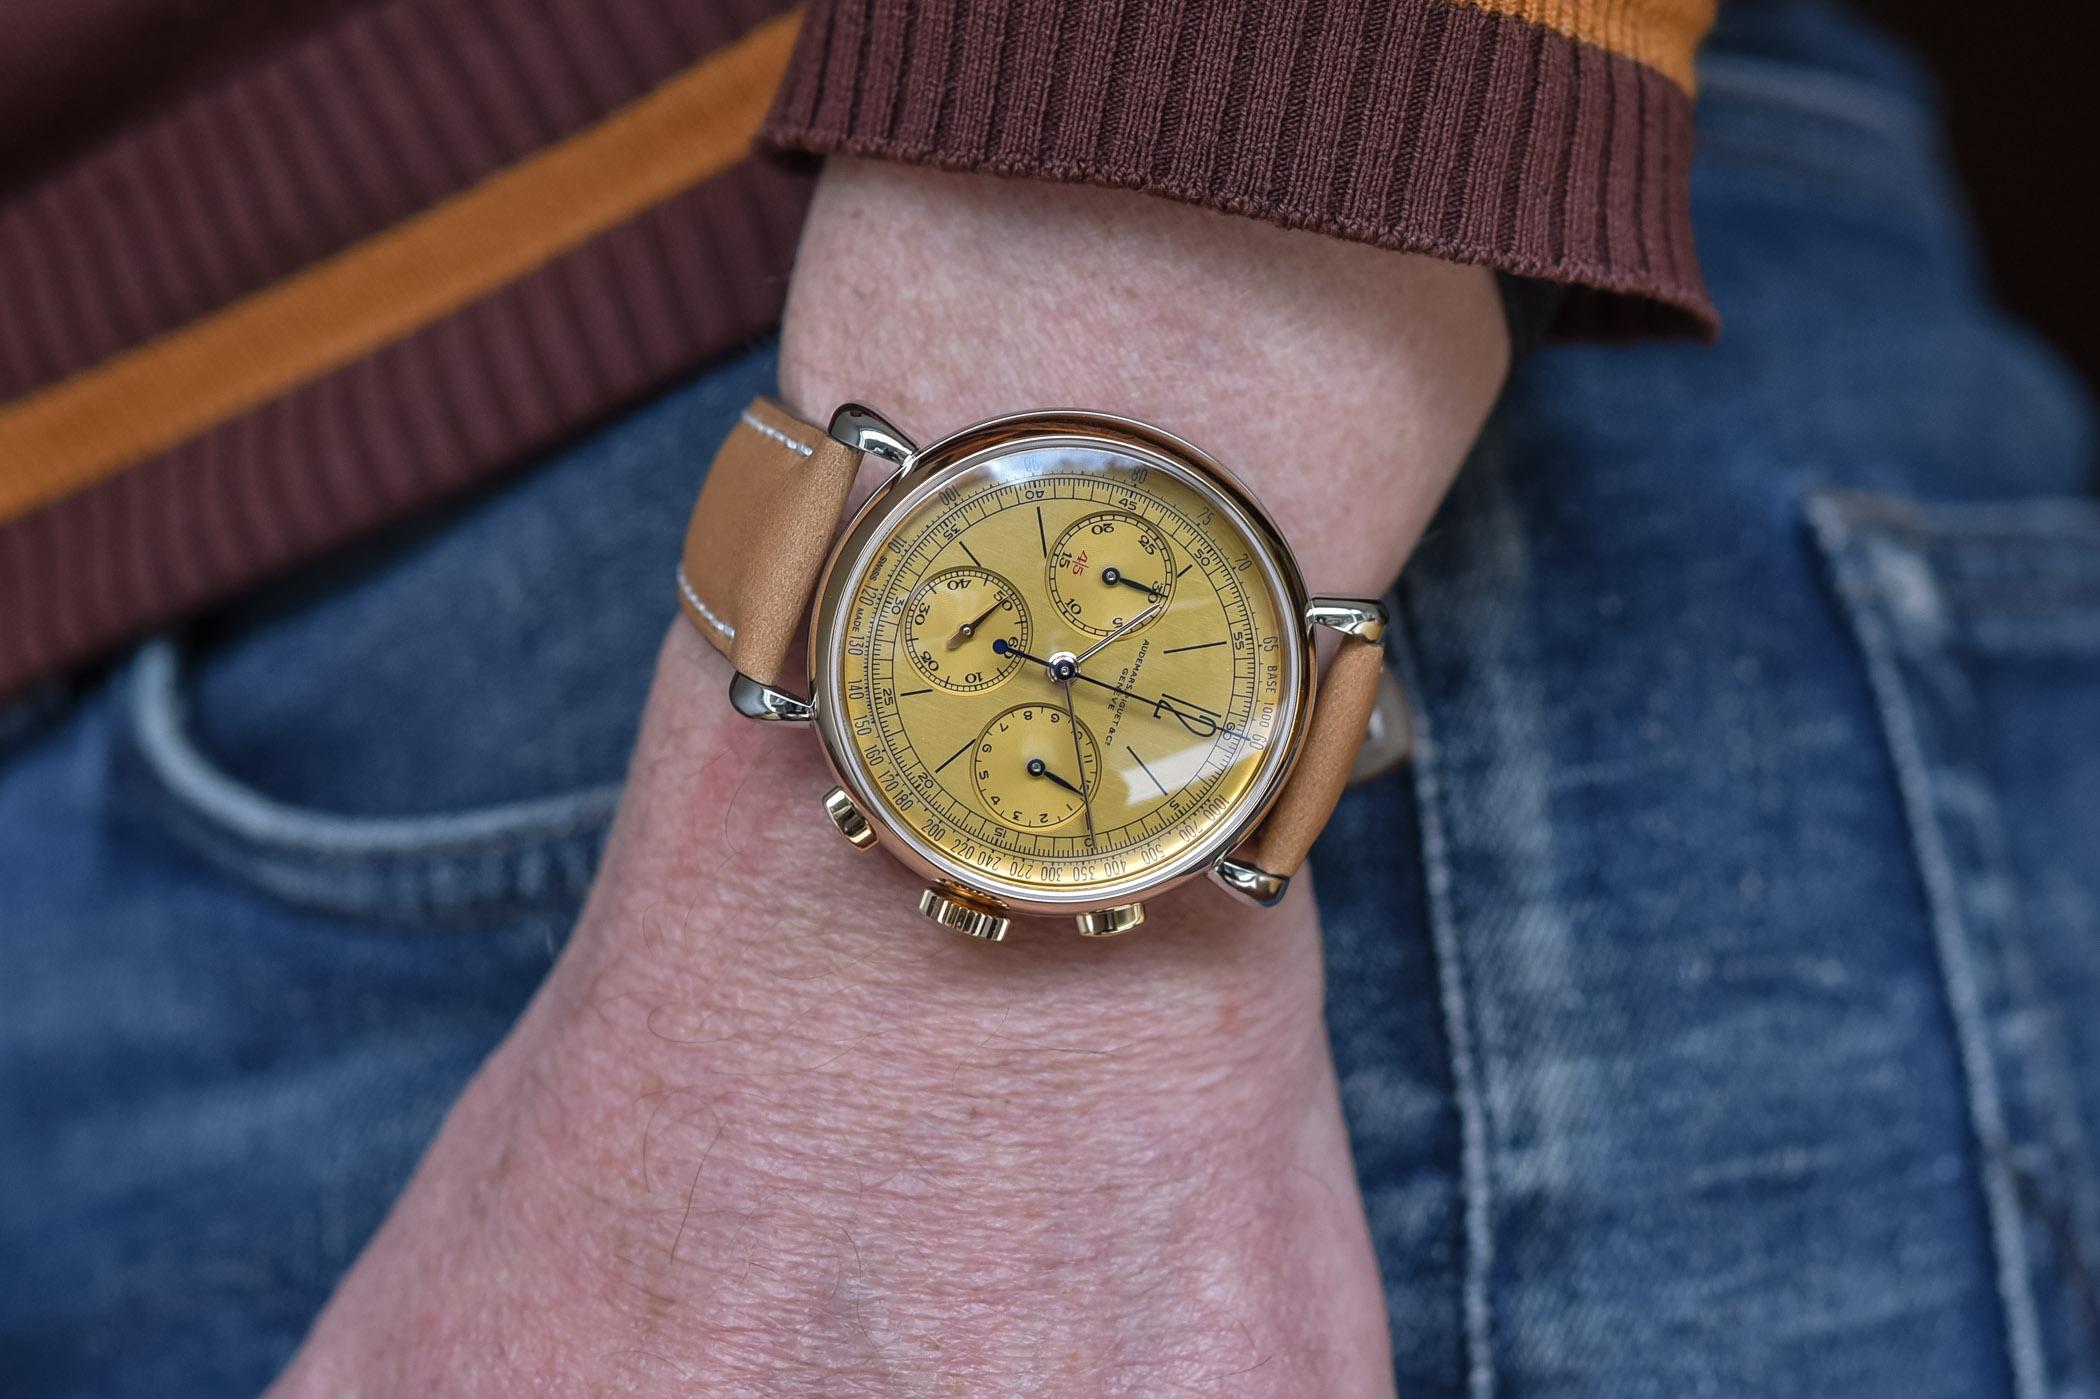 El Audemars Piguet [Re]master01 Selfwinding Chronograph, puesto